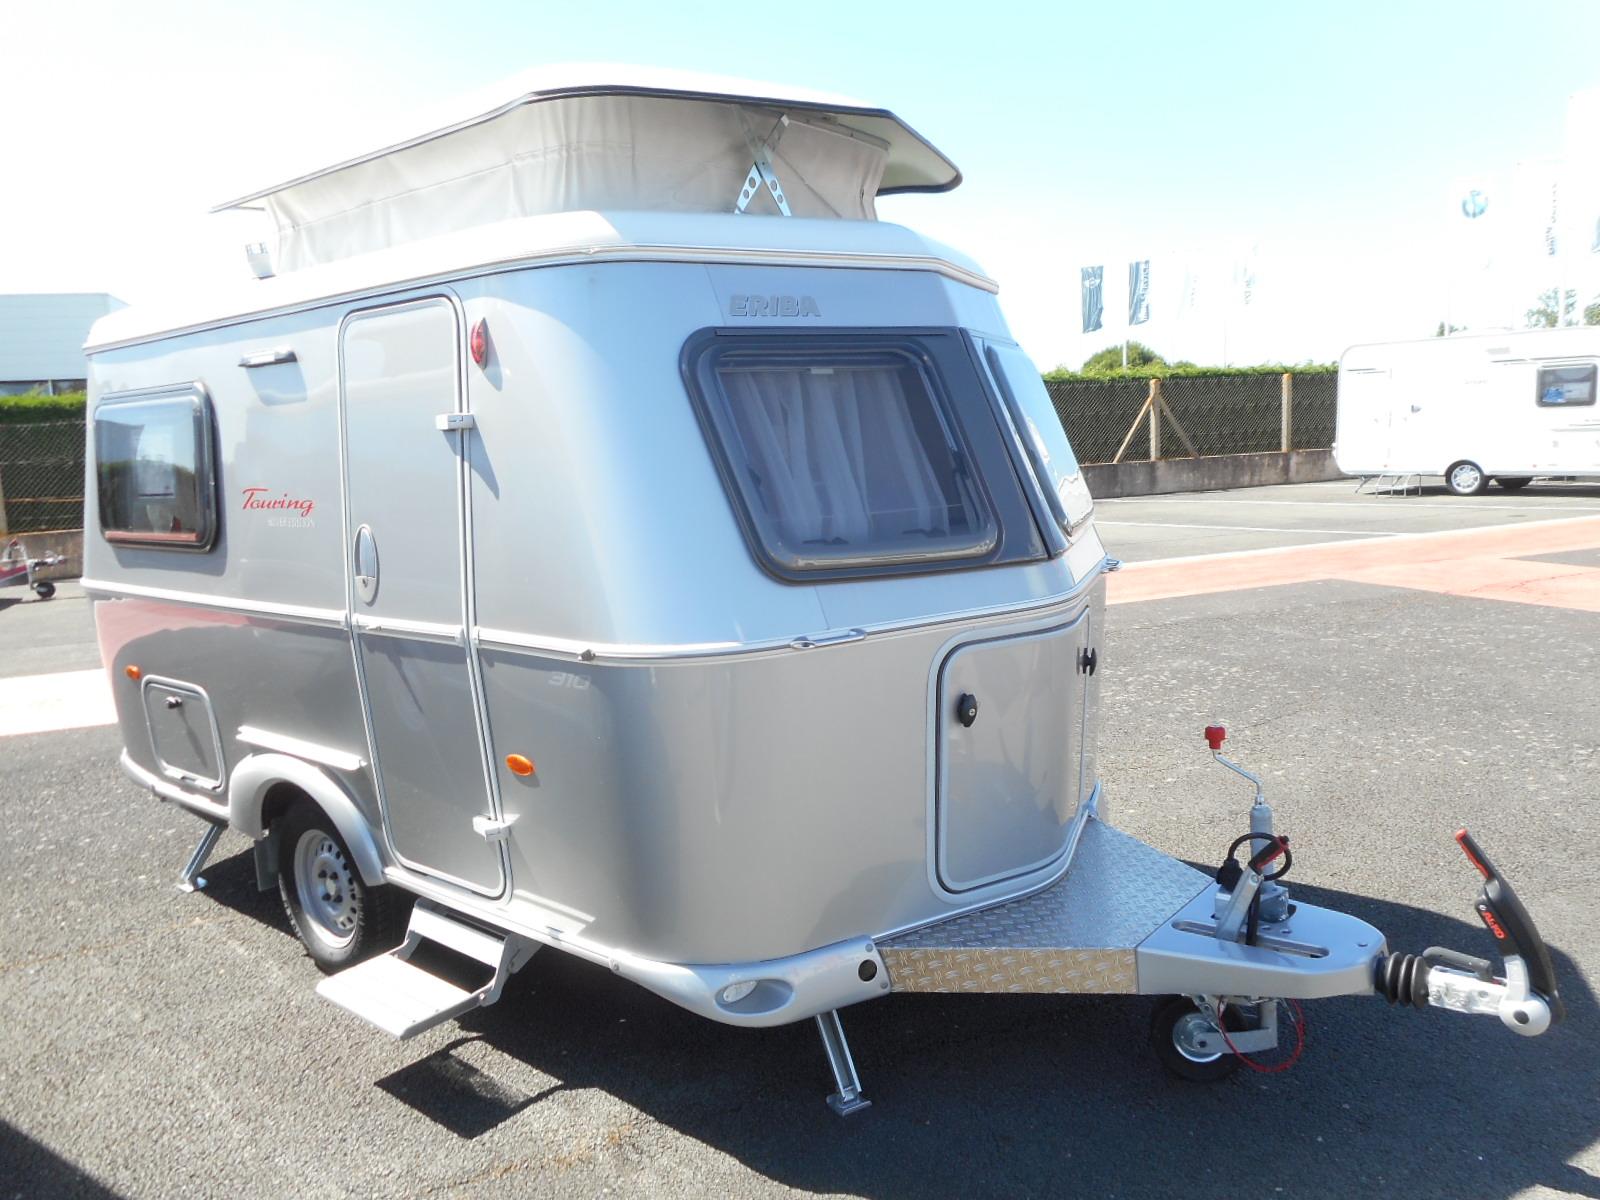 eriba familia 310 touring silver edition occasion caravane en vente rochefort charente. Black Bedroom Furniture Sets. Home Design Ideas